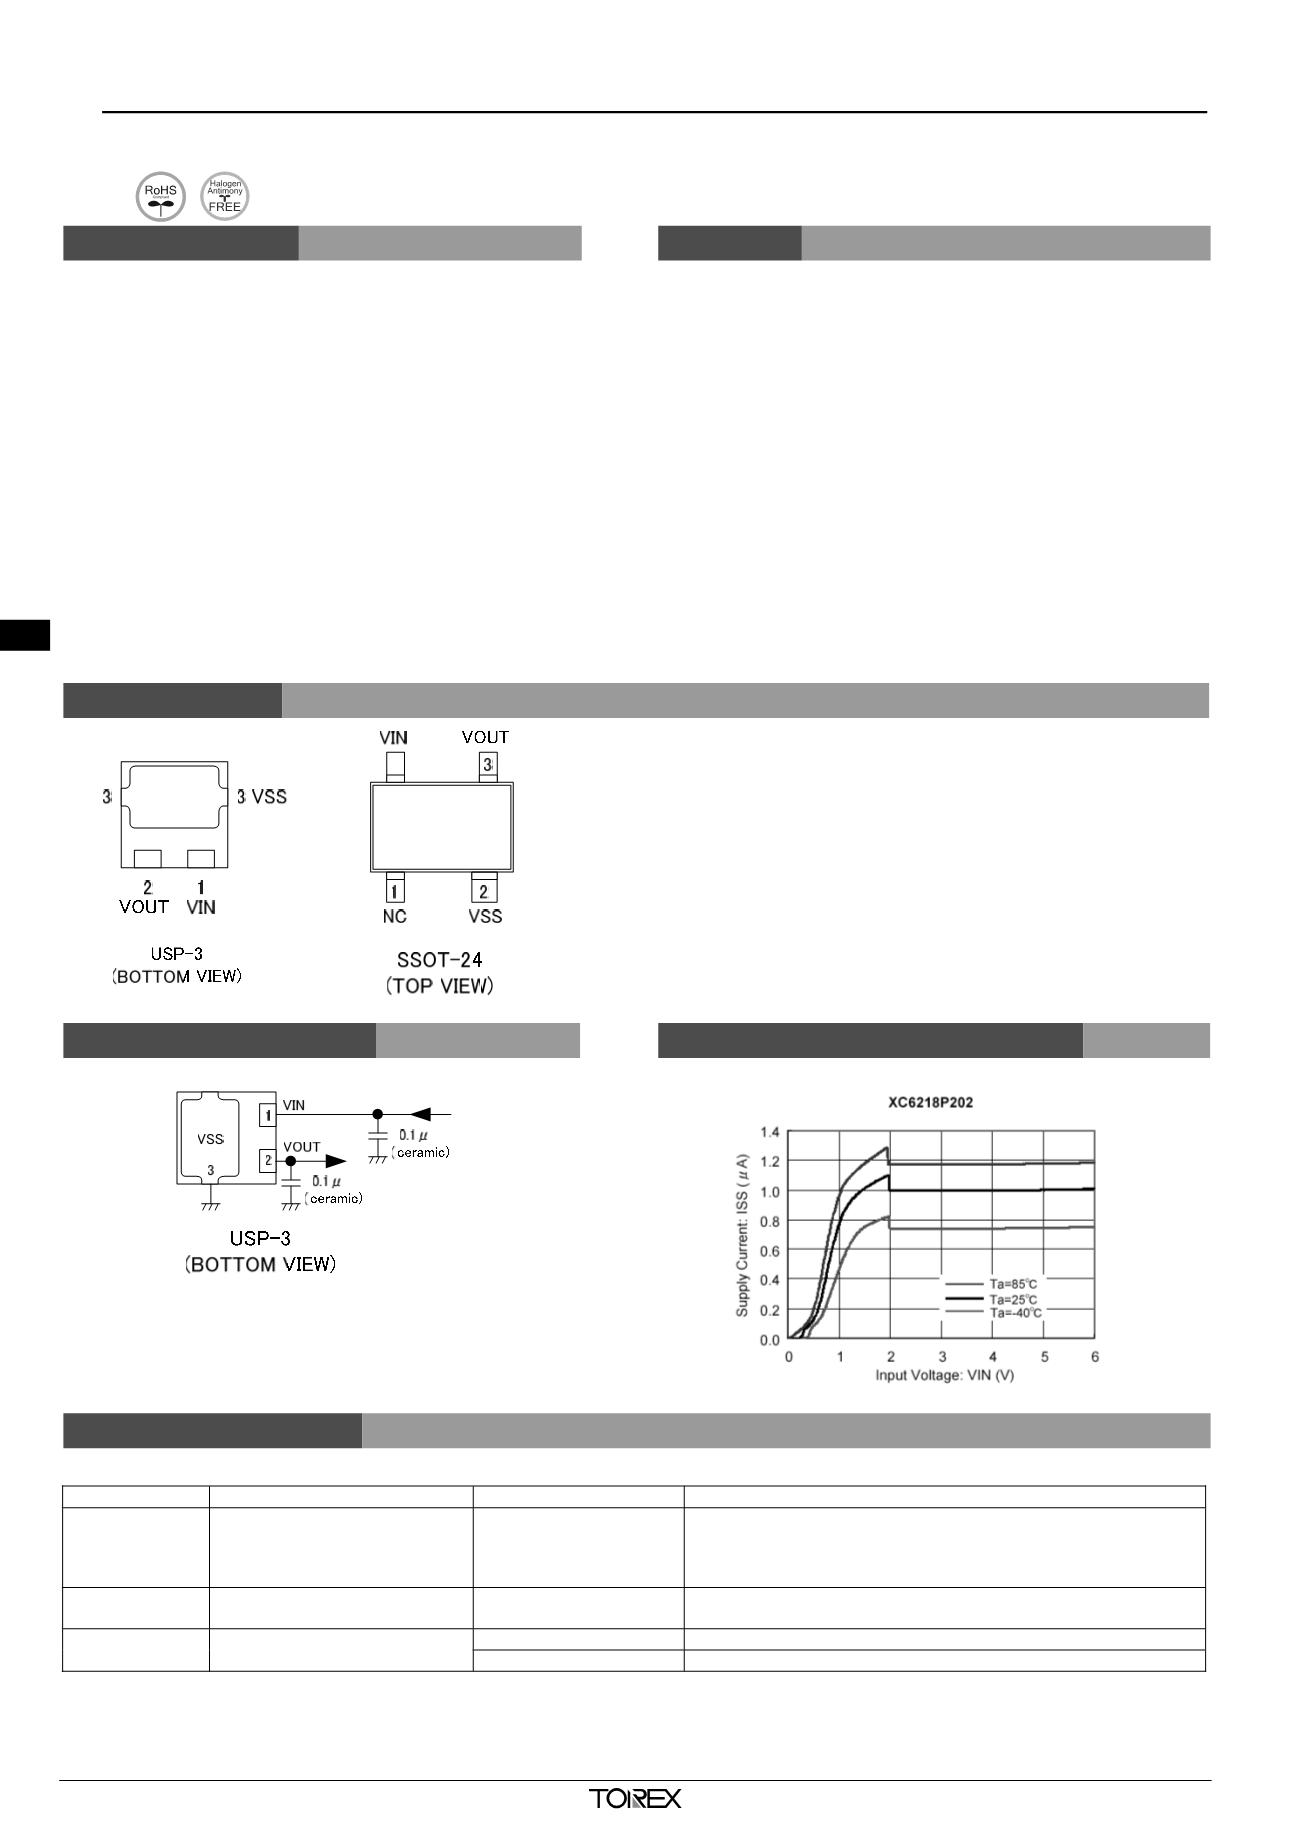 Torex 2017 Foldback Current Limiting Circuit Page 154